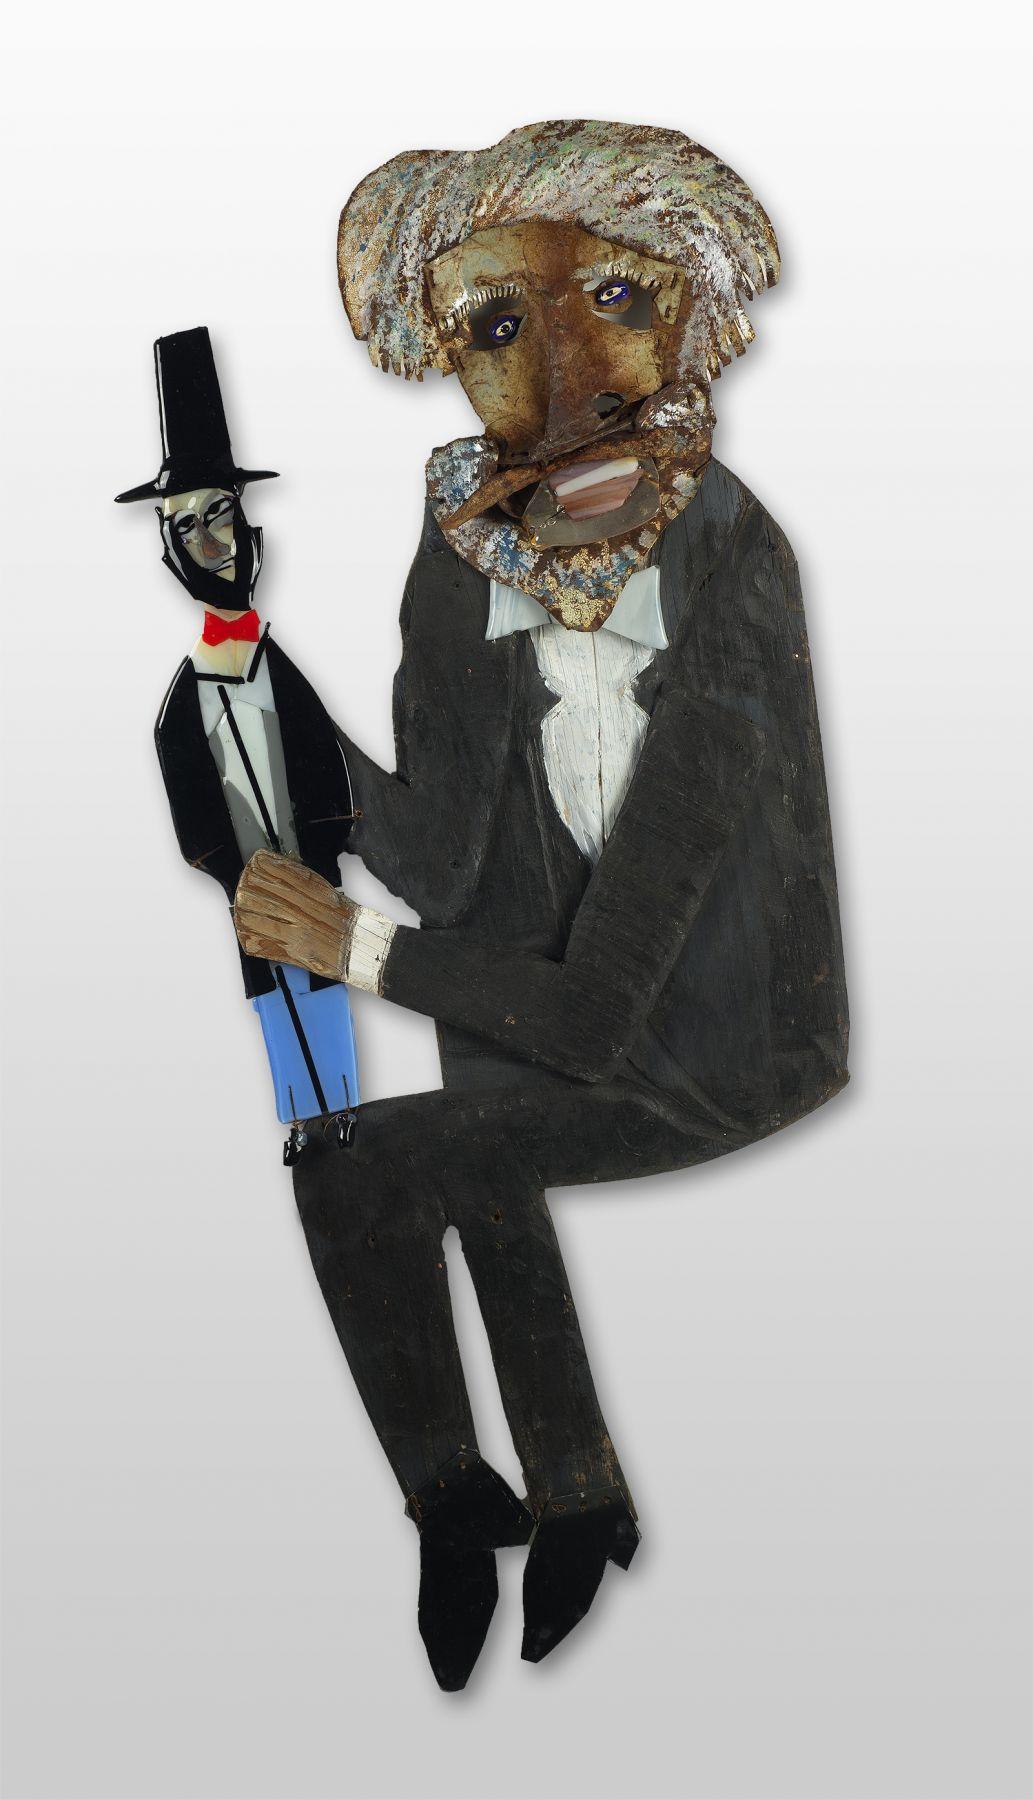 Lincoln - Douglas Debates by Mitch Berg